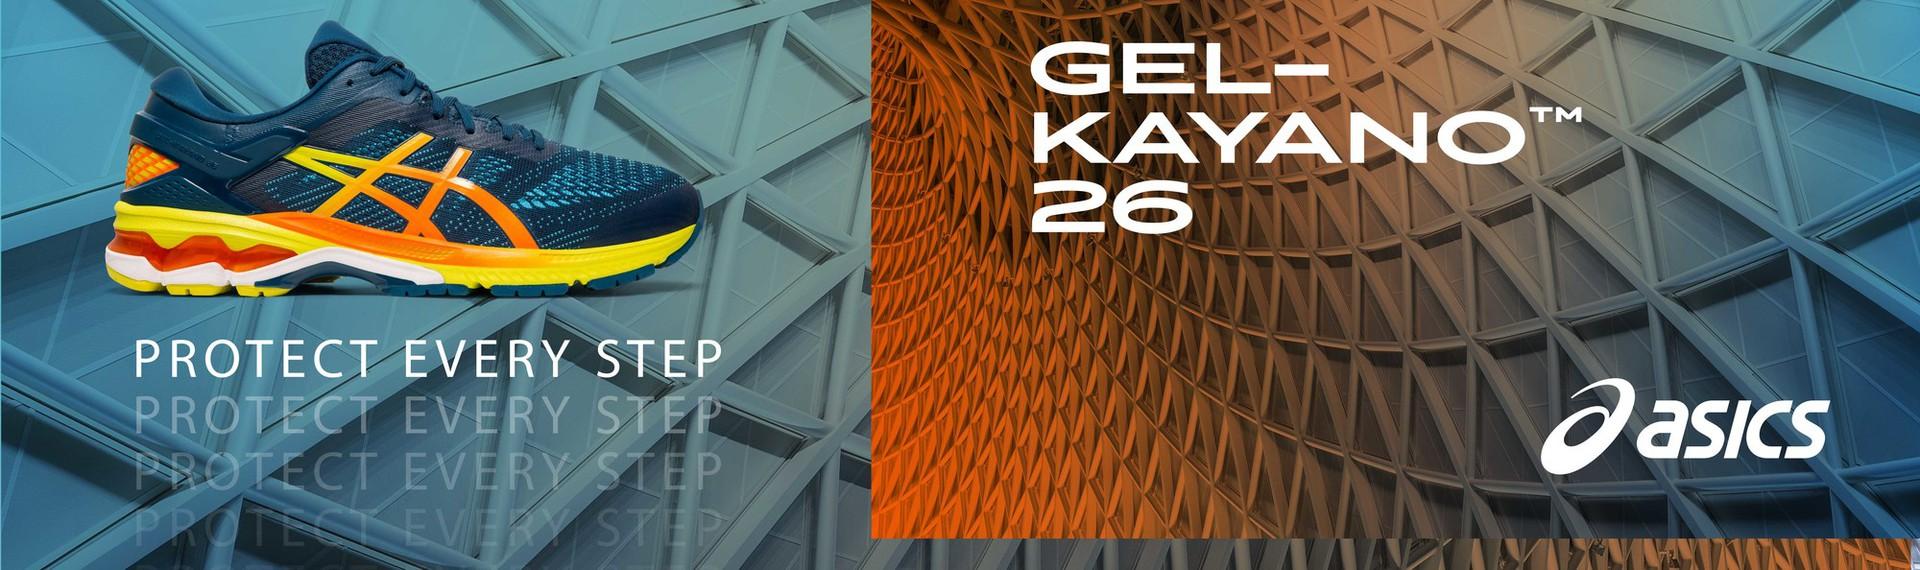 Gel Kayano 26